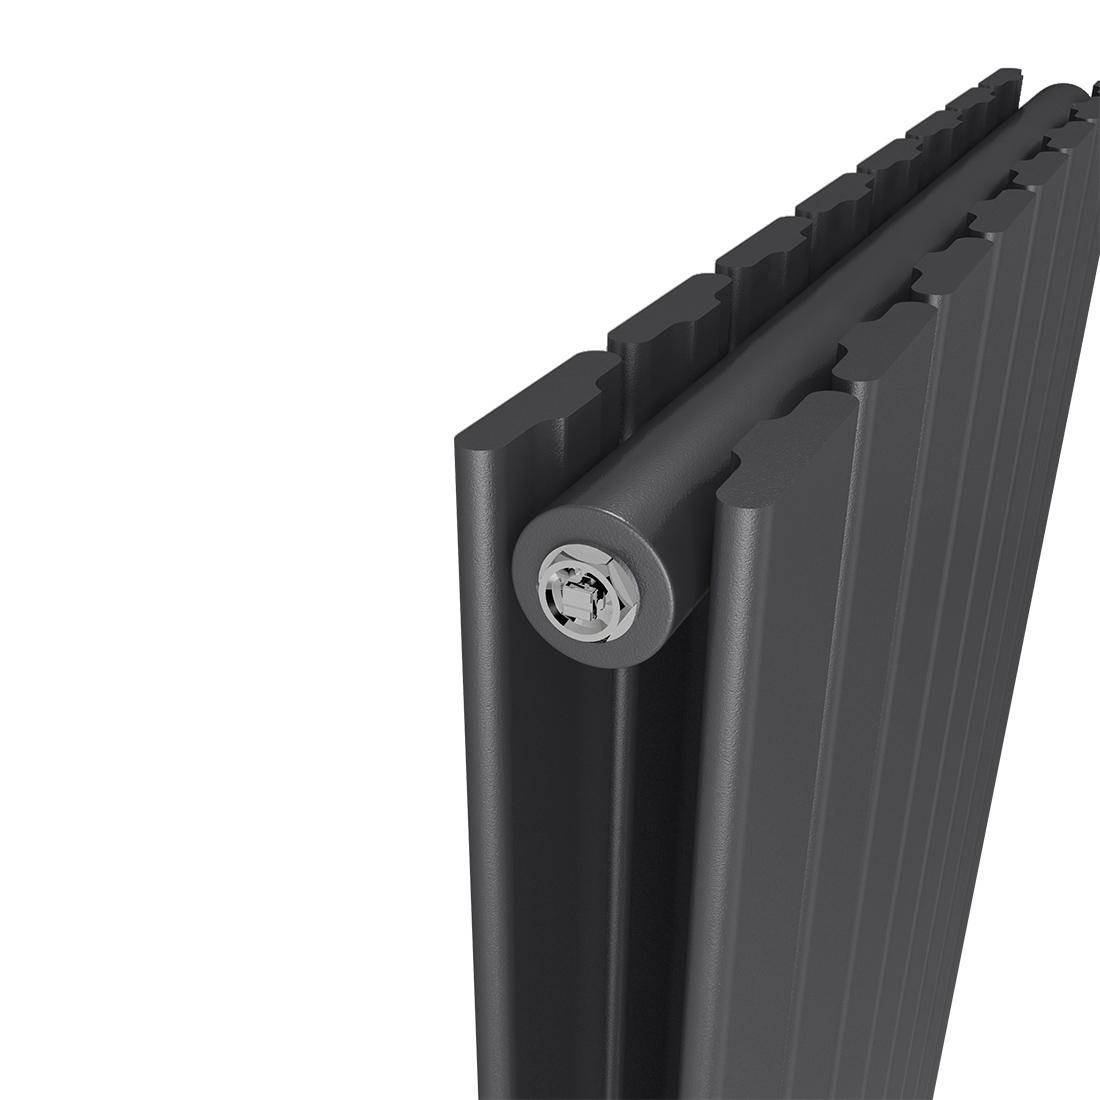 heizk rper flach paneelheizk rper doppellagig vertikal. Black Bedroom Furniture Sets. Home Design Ideas